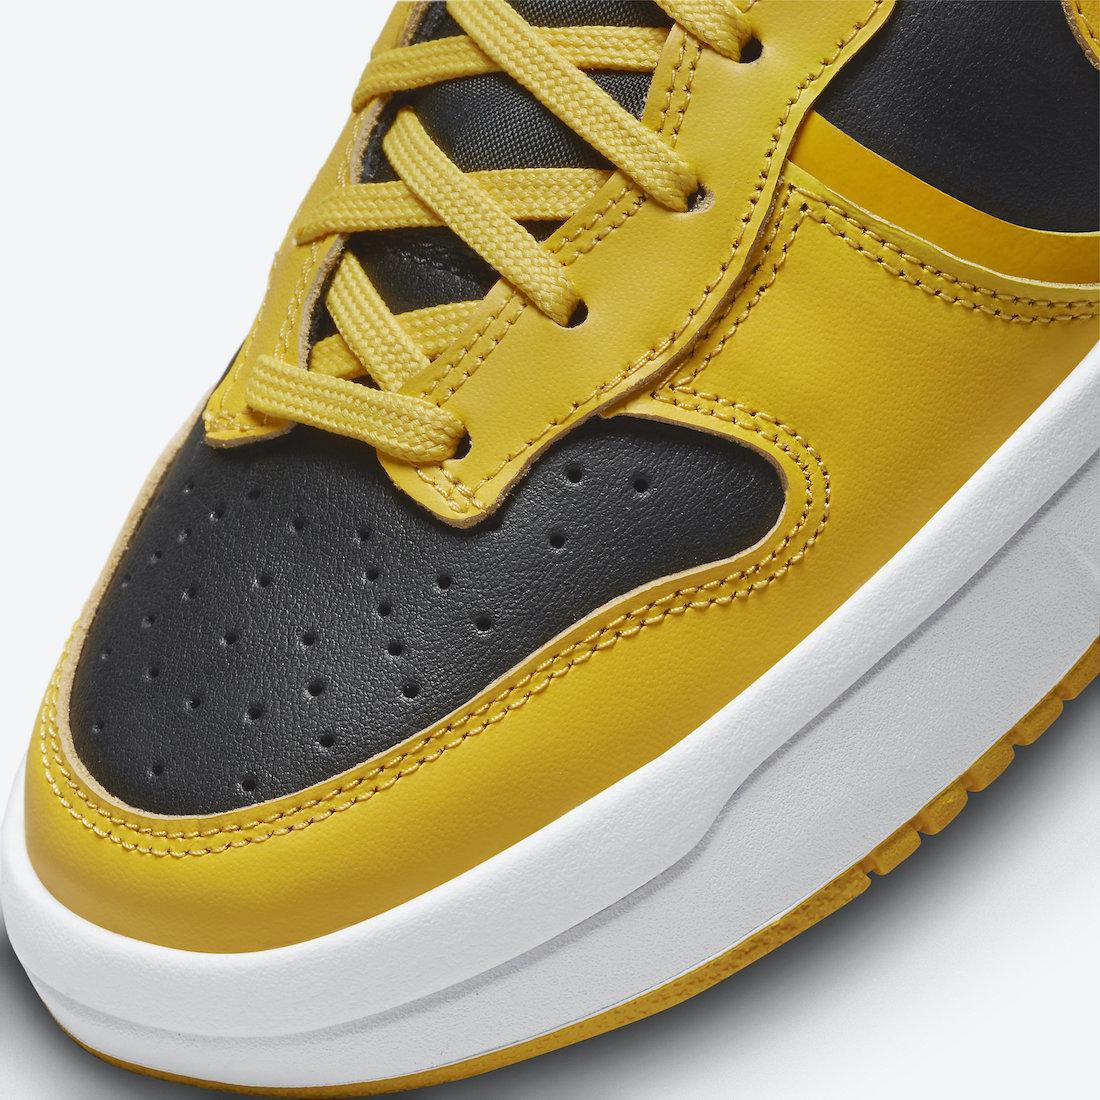 Varsity Maize, Swoosh, Nike Dunk High, Nike Dunk, NIKE, HIGH, FORCE 1, Dunk High, Dunk, Air Jordan